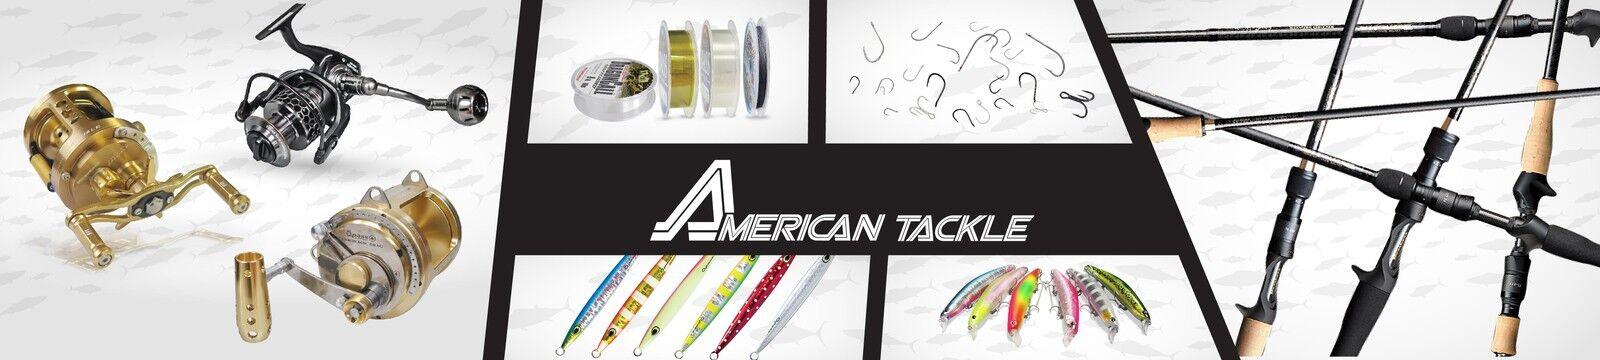 American Tackle